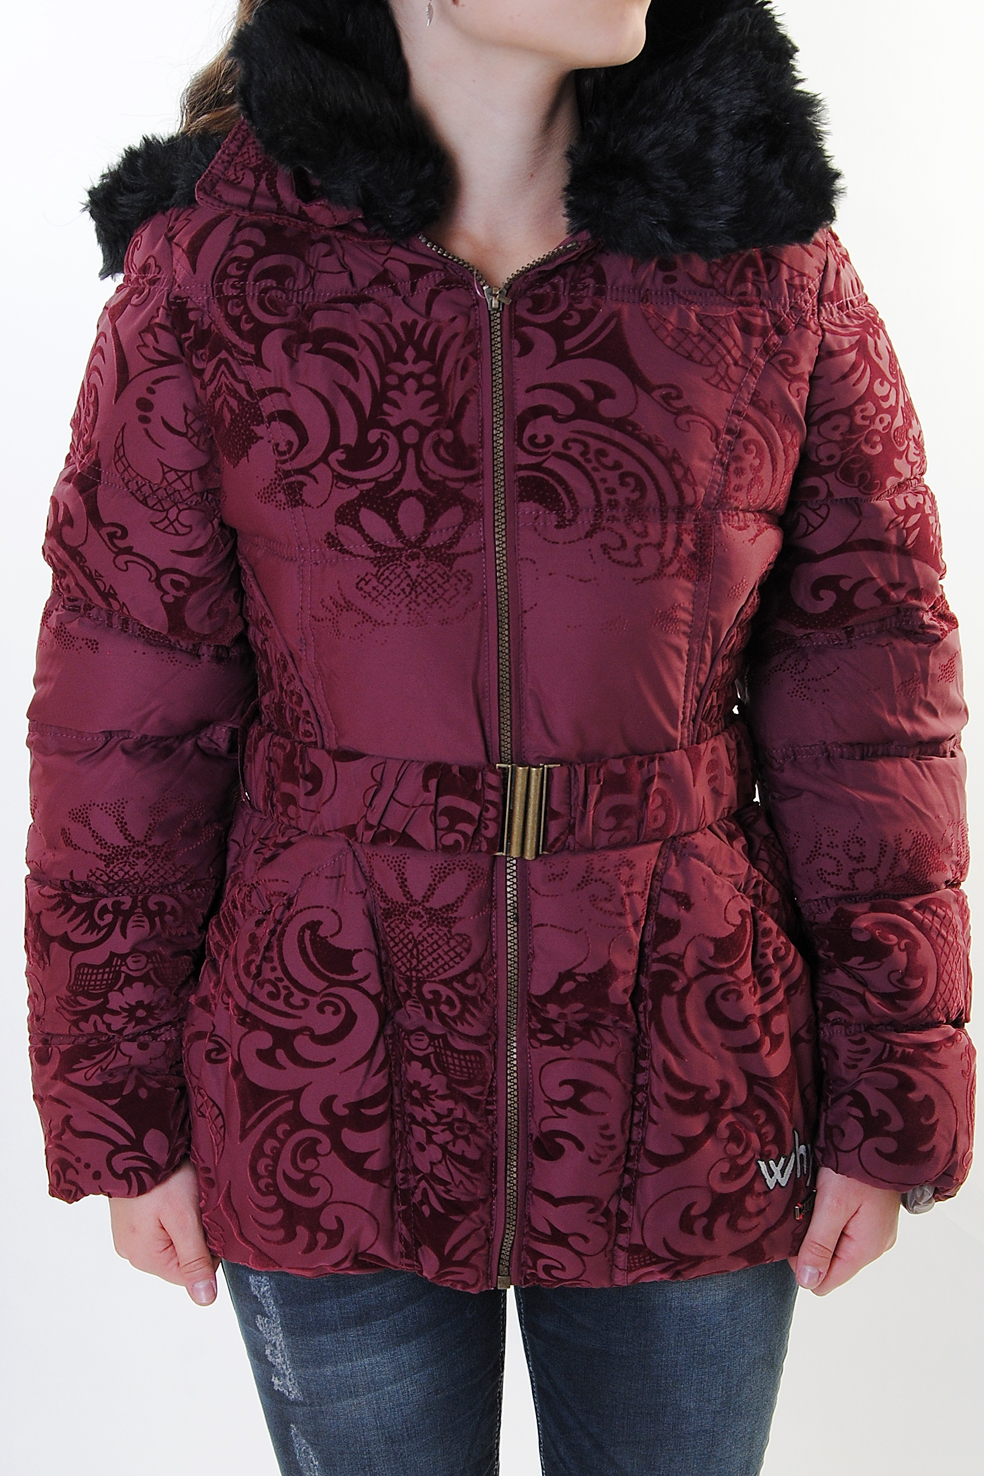 desigual damen winterjacke rocio weinrot 46e2925 3082 ebay. Black Bedroom Furniture Sets. Home Design Ideas